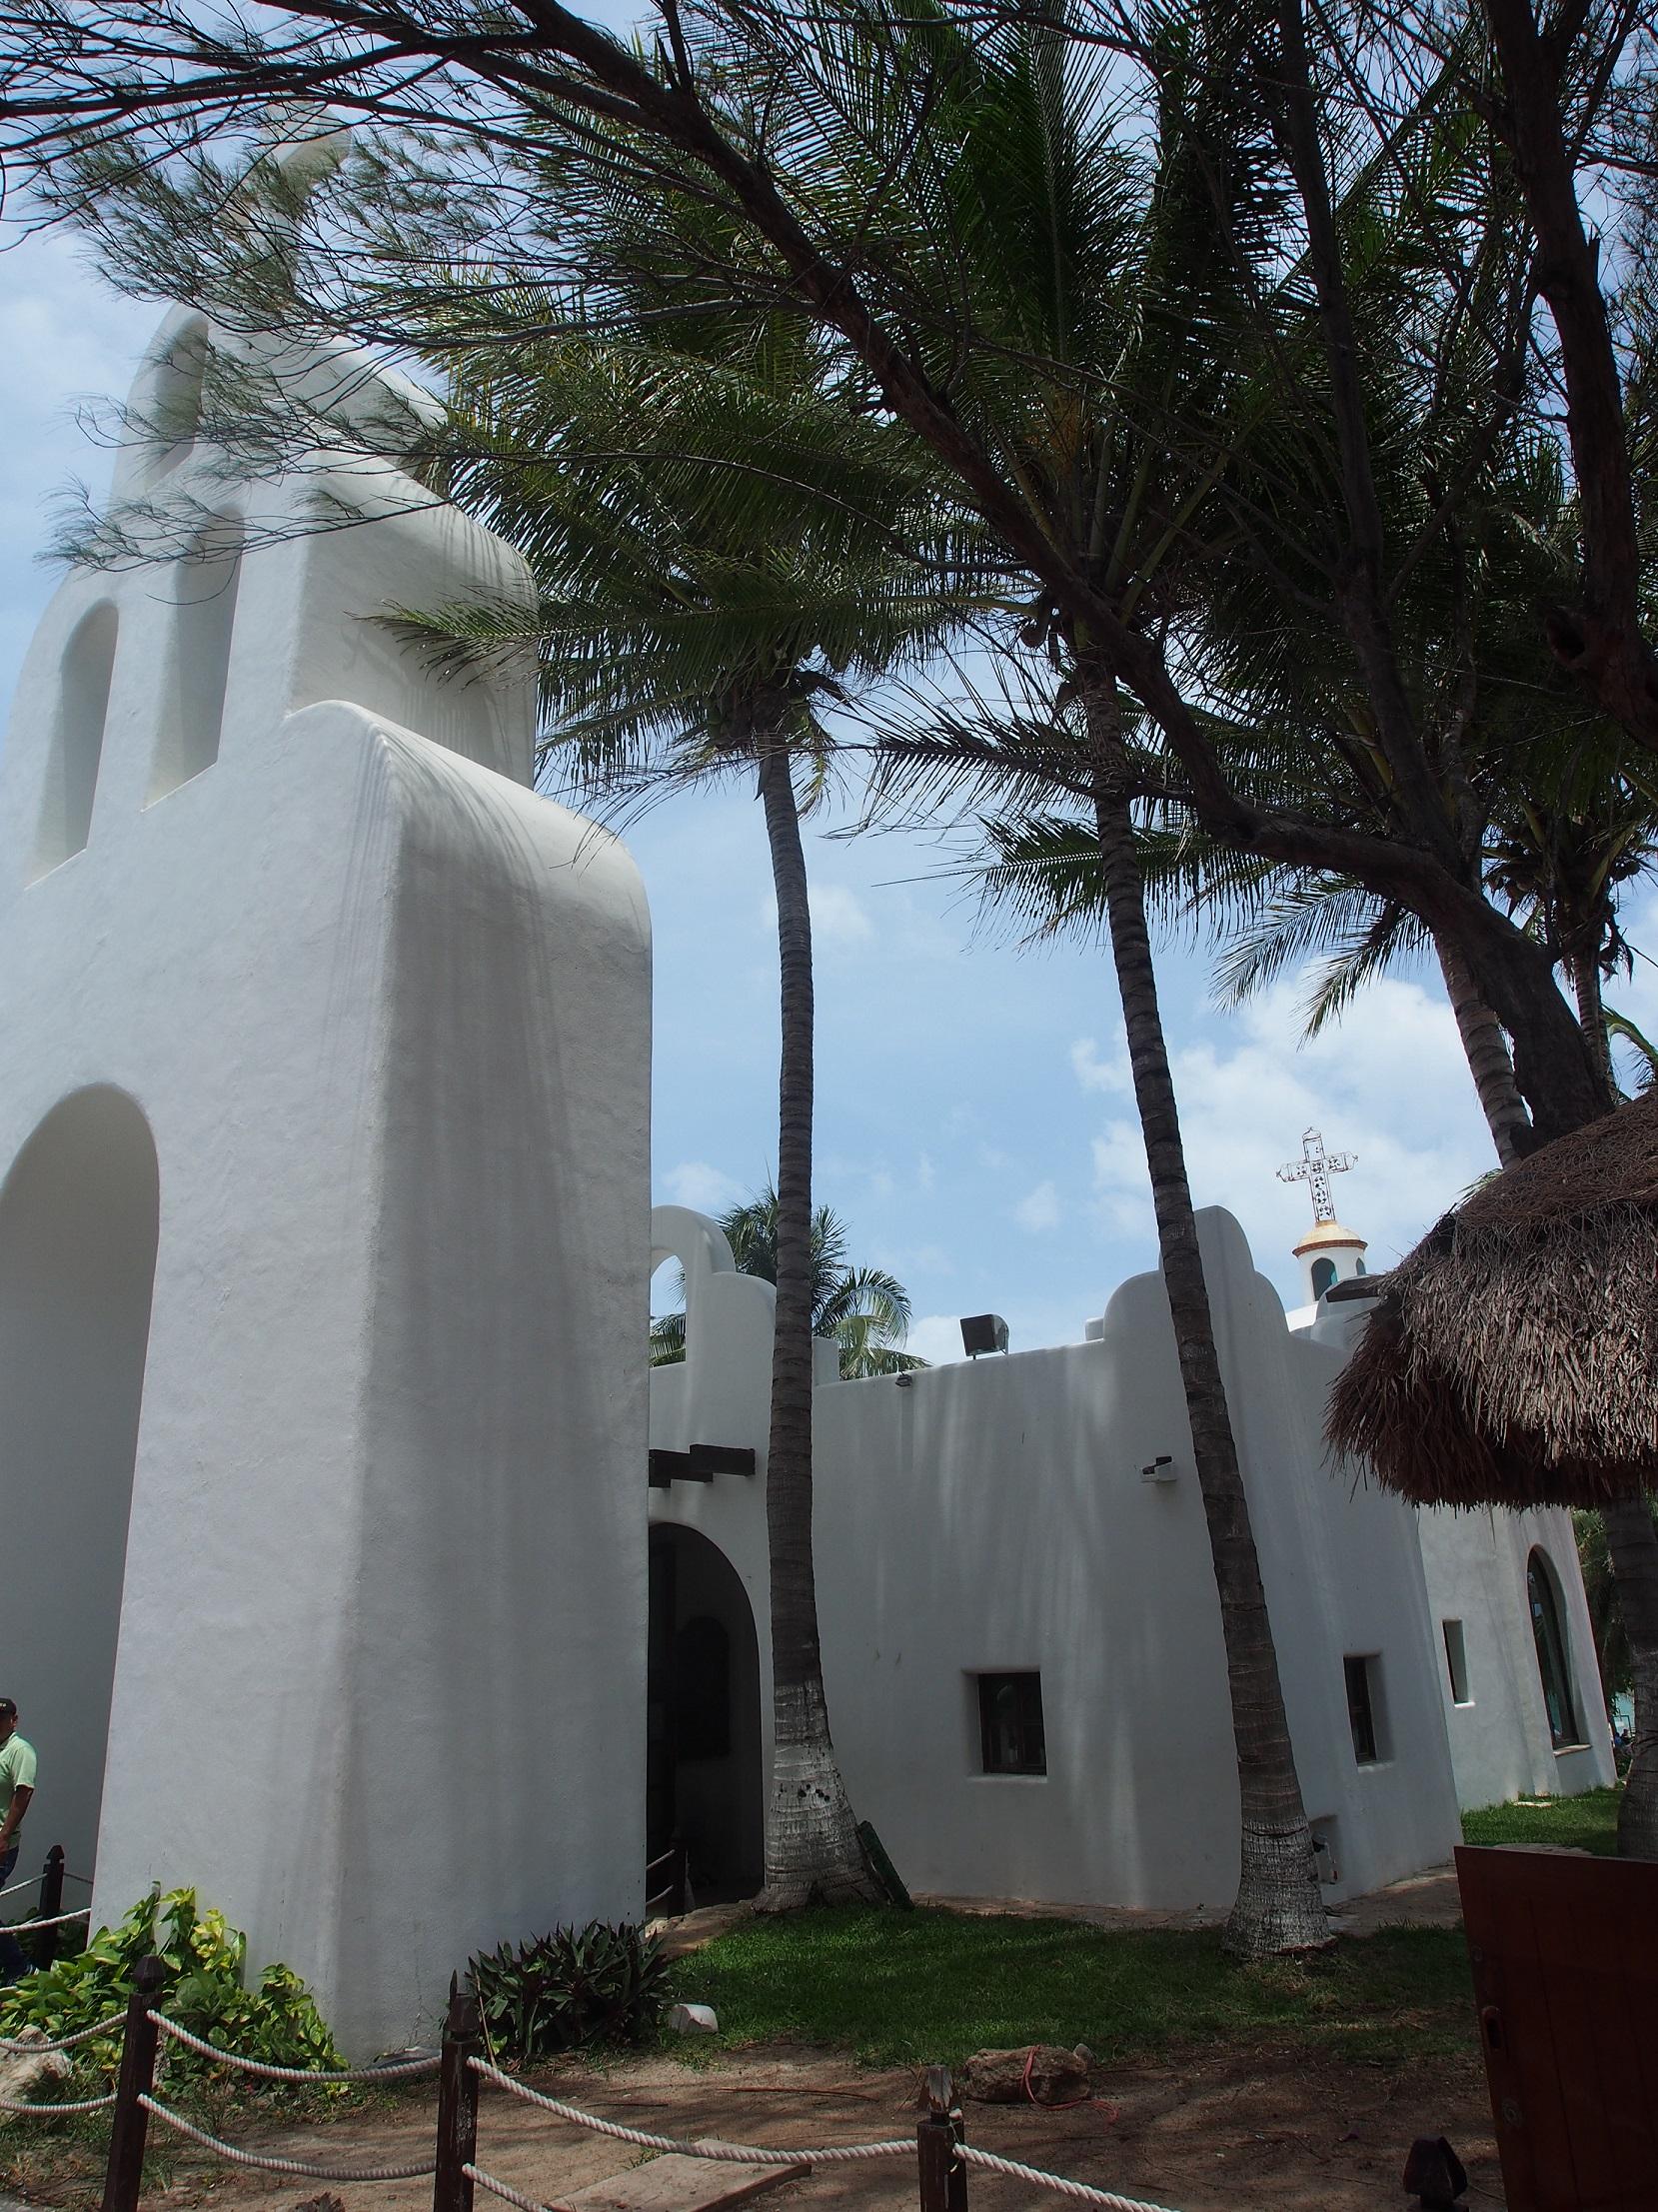 playa-del-carmen-mexico-girl-in-chief-blog-3